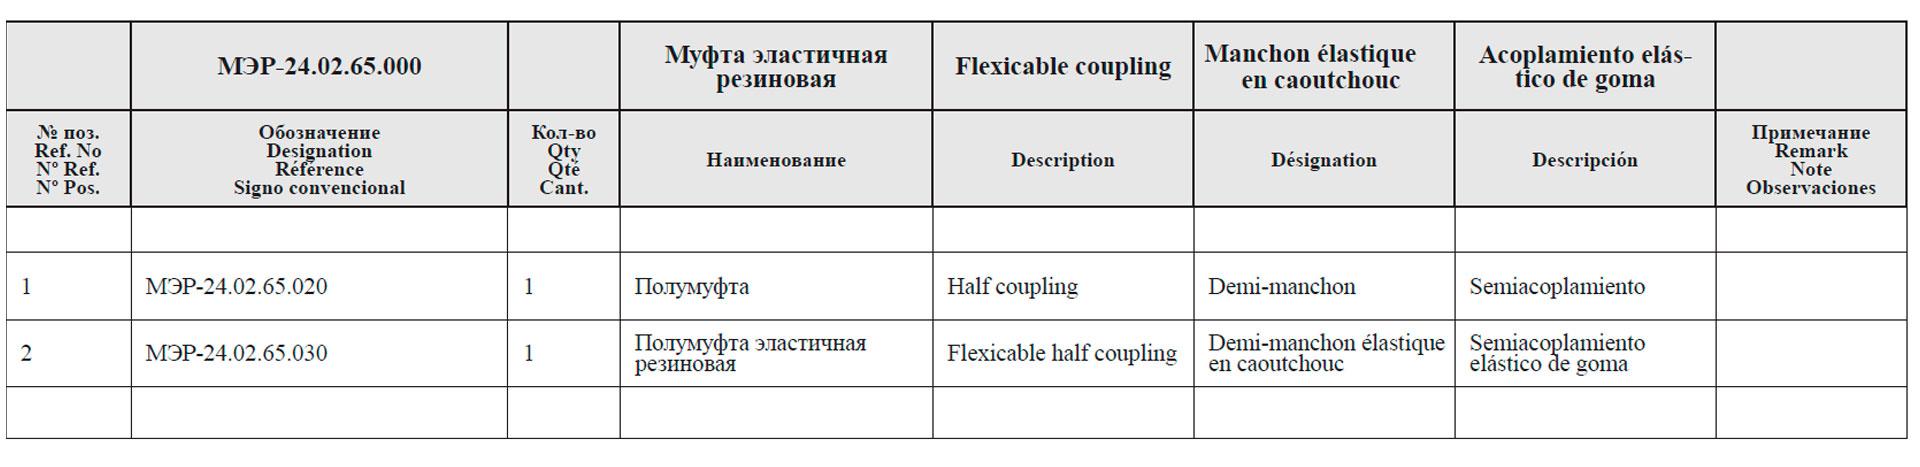 Муфта эластичная резиновая МЭР-24.02.65.000